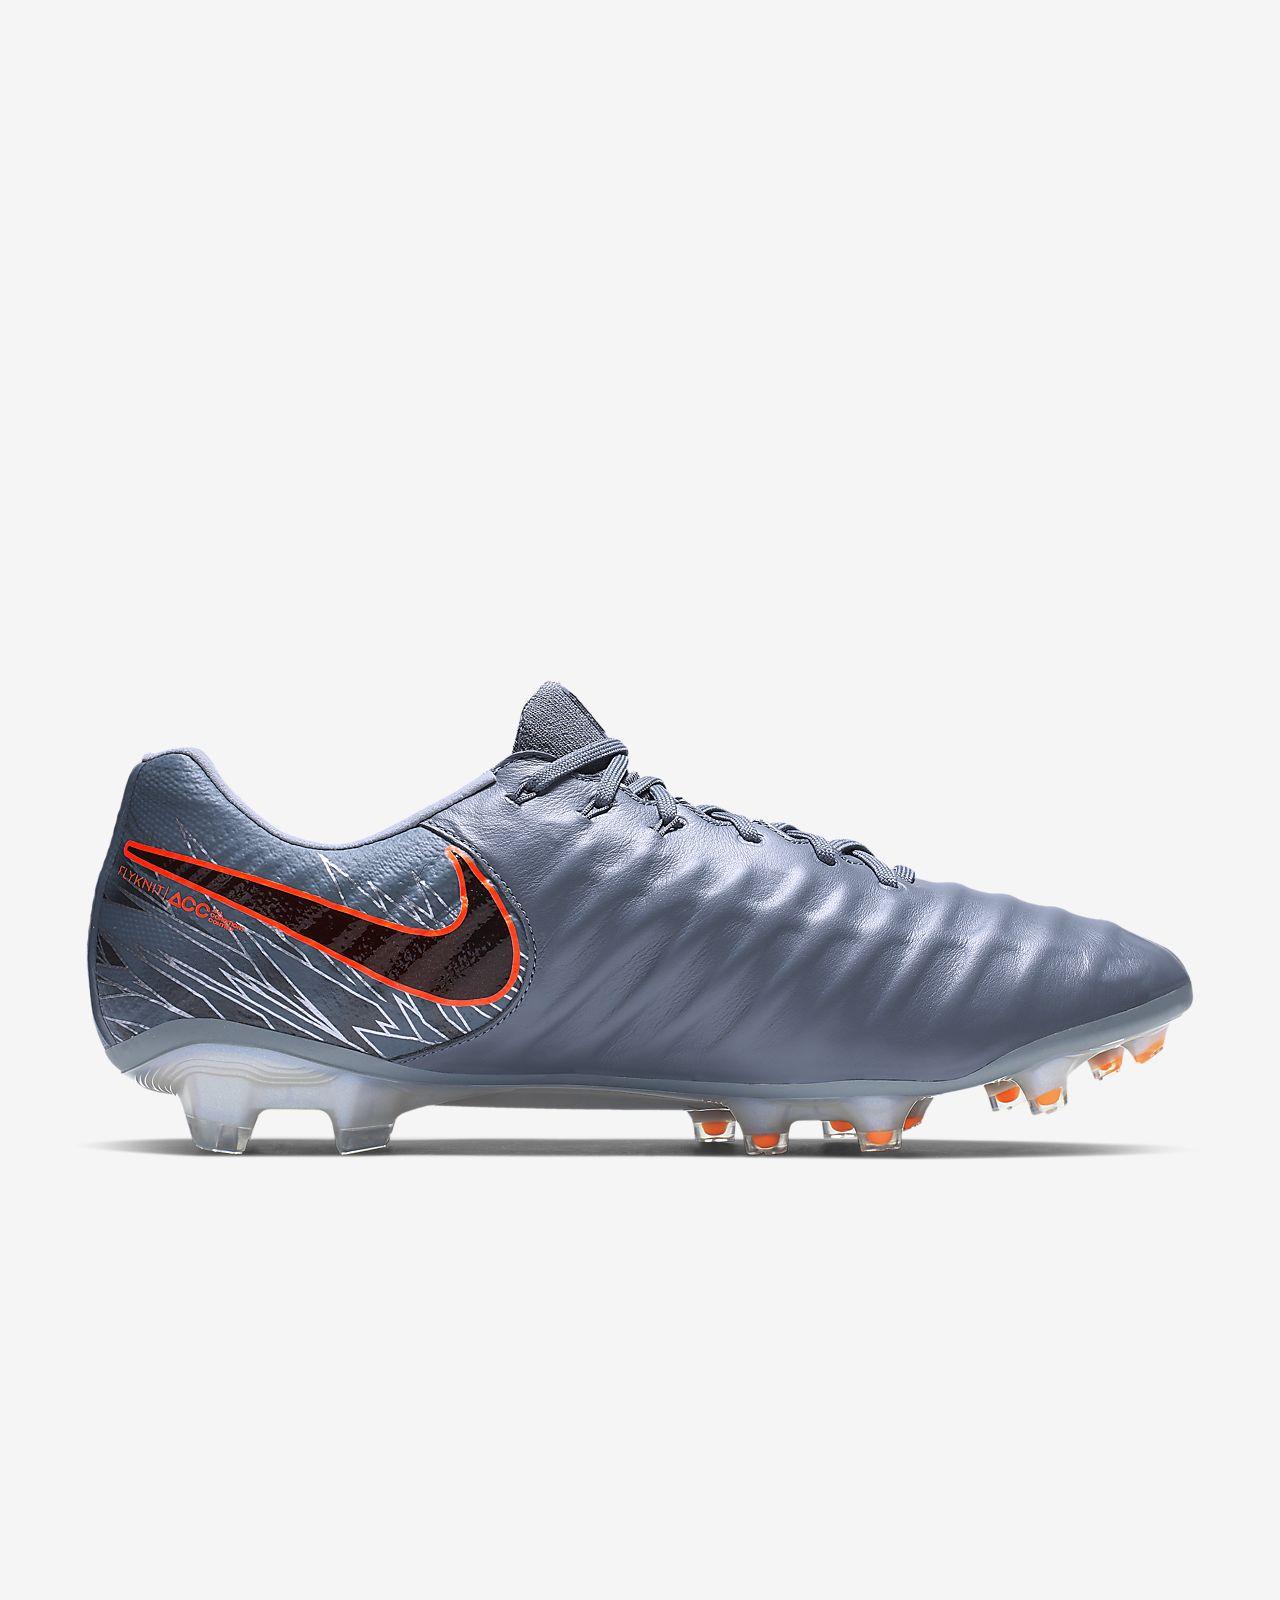 b41ac20567f Nike Tiempo Legend 7 Elite FG Botas de fútbol para terreno firme ...